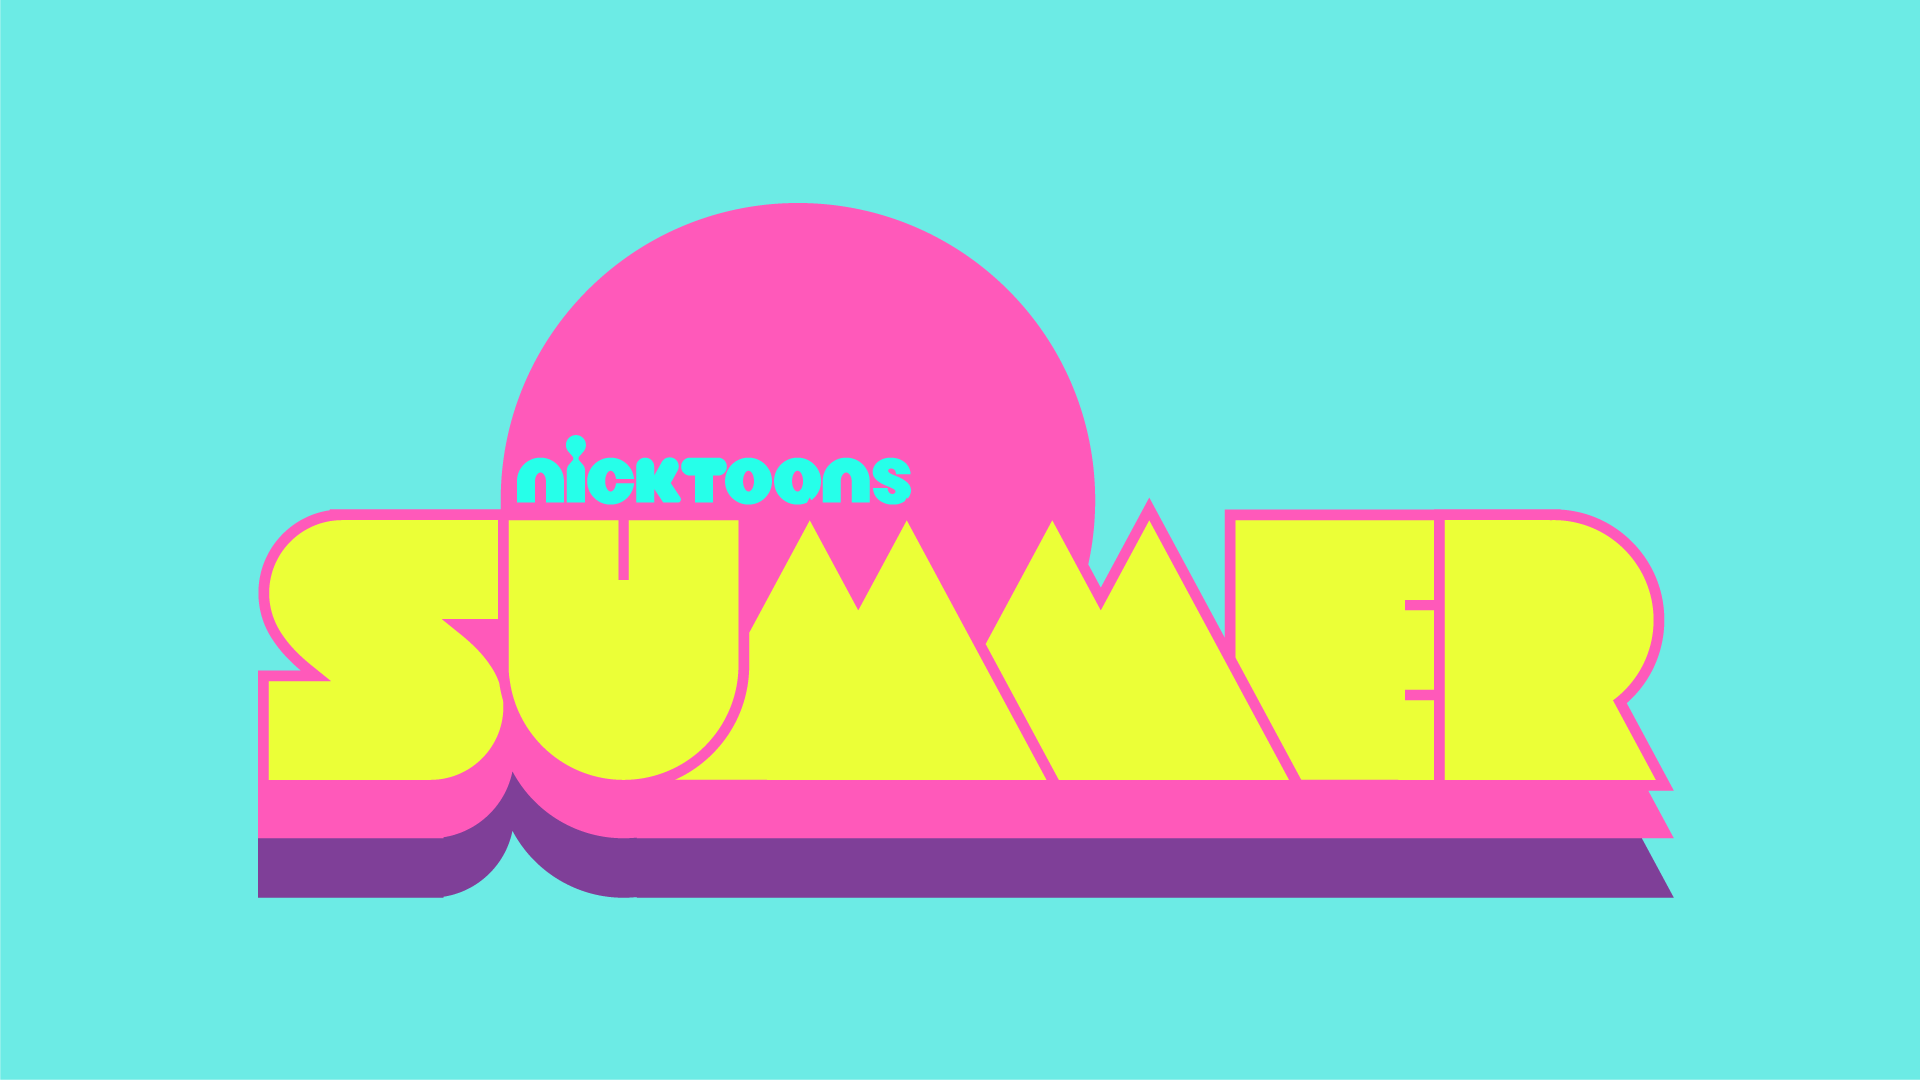 Nicktoons_Summer_Process_Justin-Harder_04.png